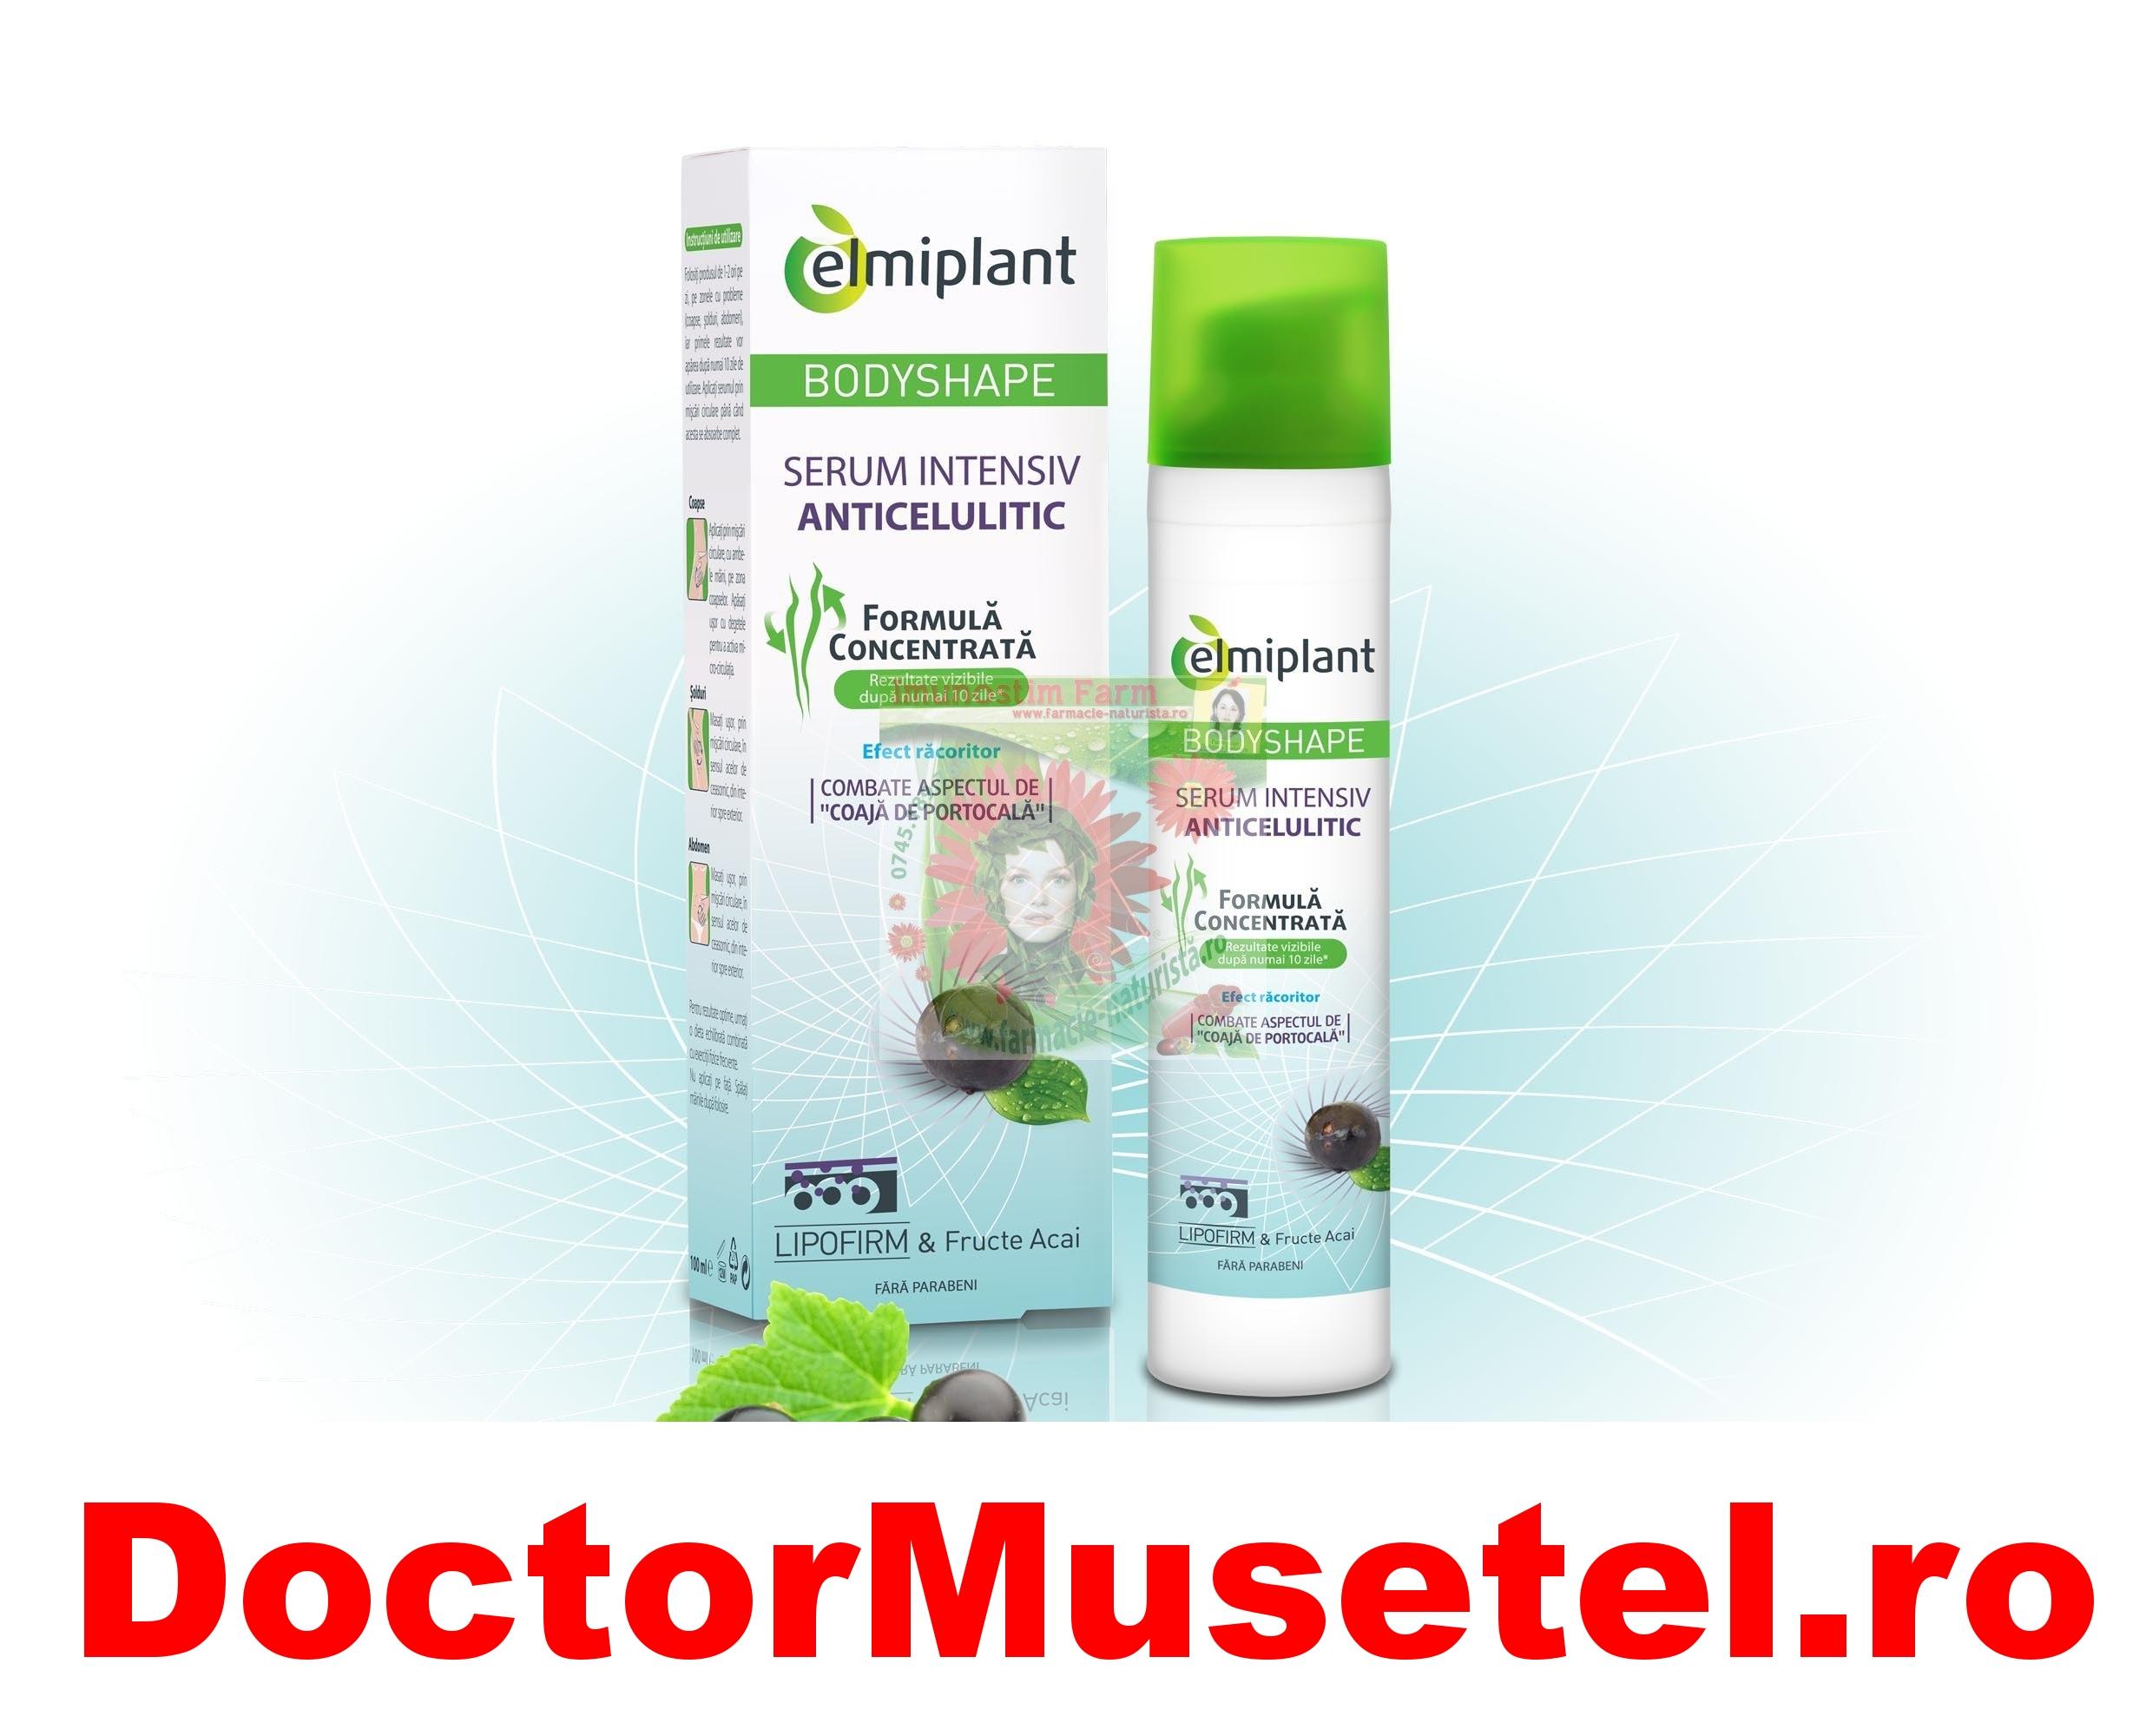 bodyshape-serum-intensiv-group-BODYSHAPE-Ser-anticelulitic-si-fermitate-100ml-ELMIPLANT-www-farmacie-naturista-ro.jpg